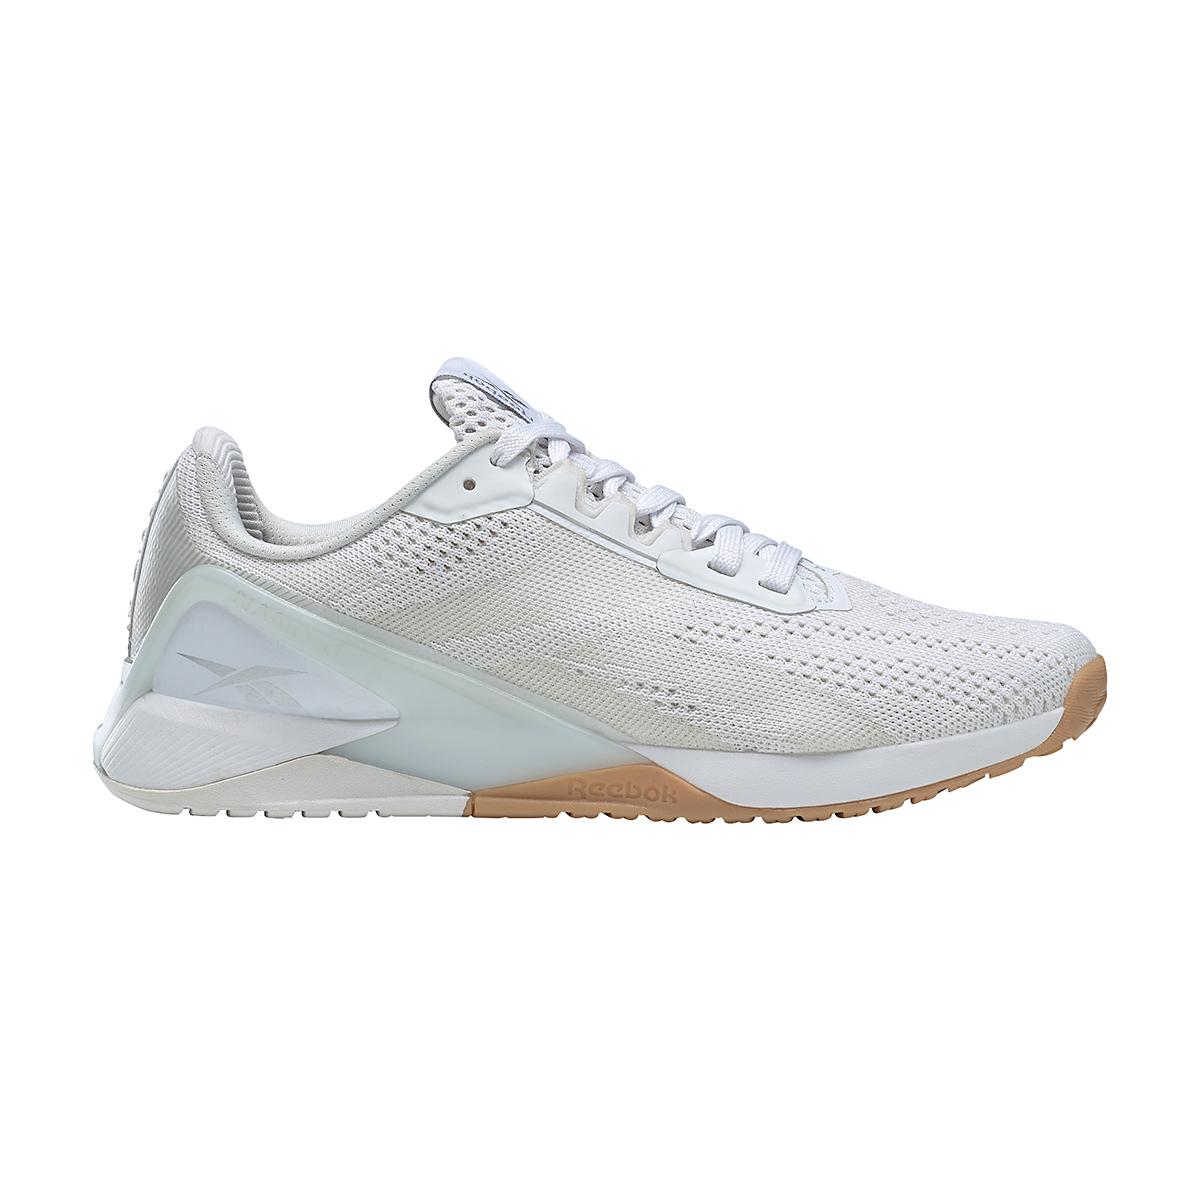 Women's Reebok Nano X1 Training Shoe - Color: White/True Grey/Rubber Gum - Size: 5 - Width: Regular, White/True Grey/Rubber Gum, large, image 1